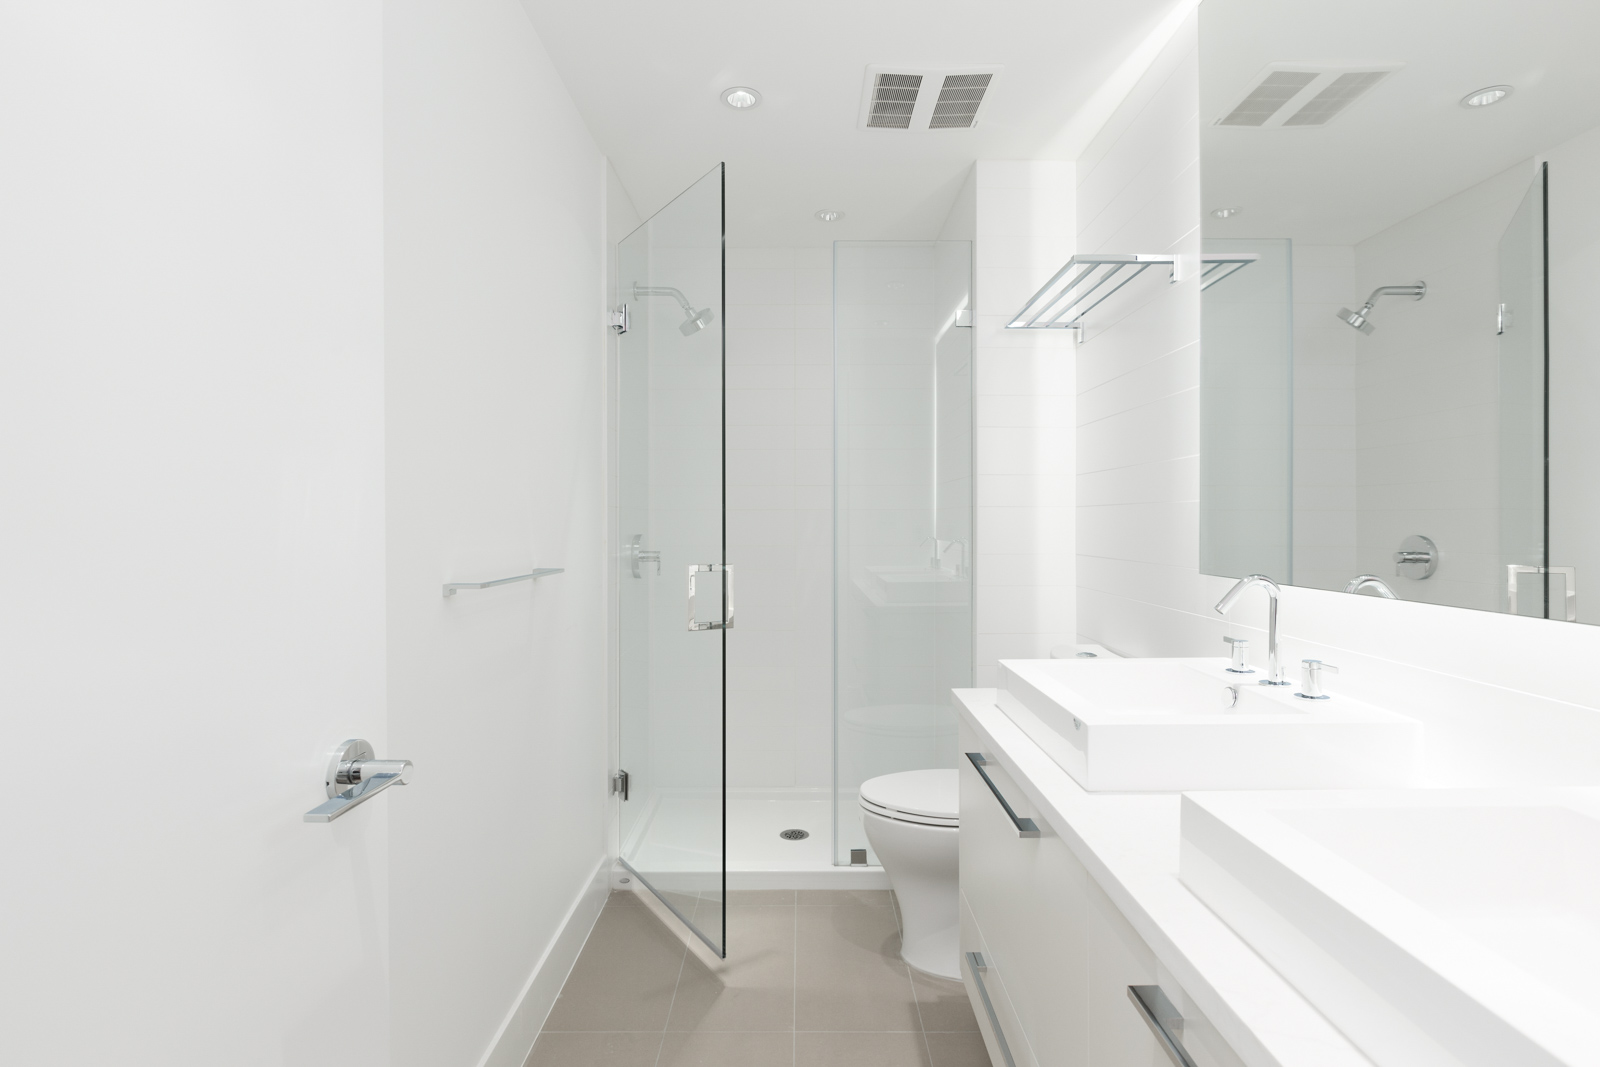 Condo bathroom in Kings Crossing condo rental property in Highgate village and Edmonds neighbourhood in Burnaby